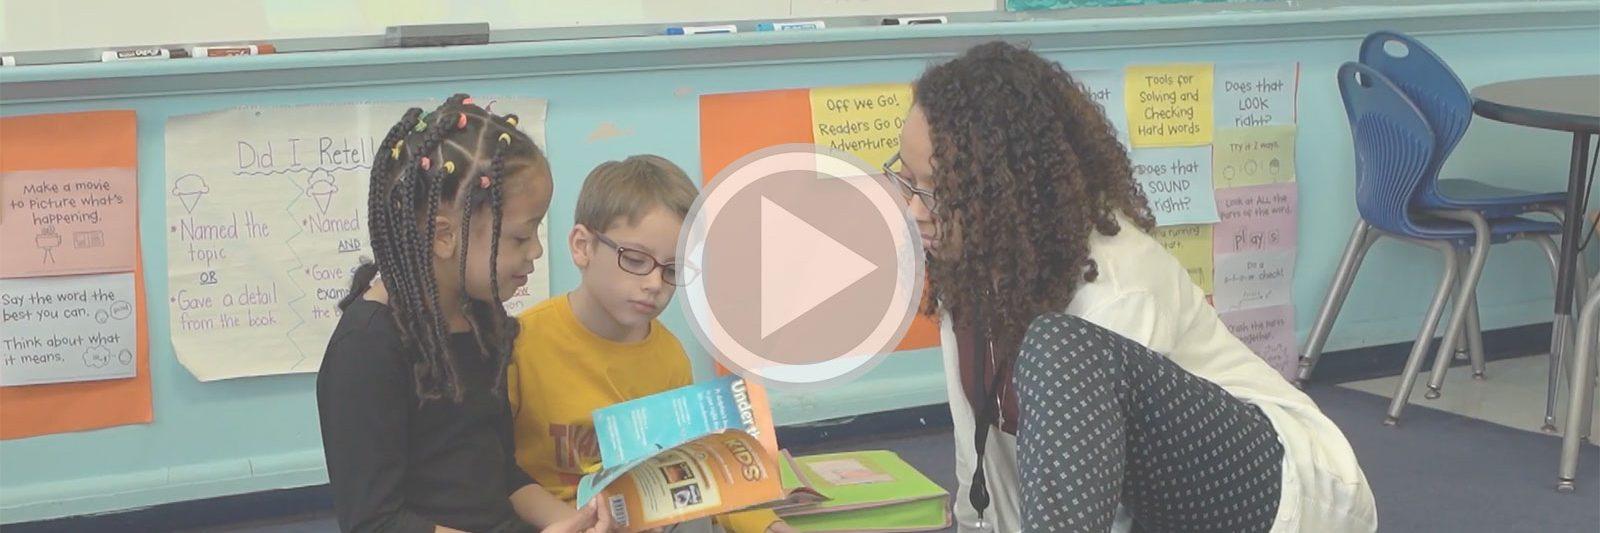 Fall 2019 Neag School Scholarship Video